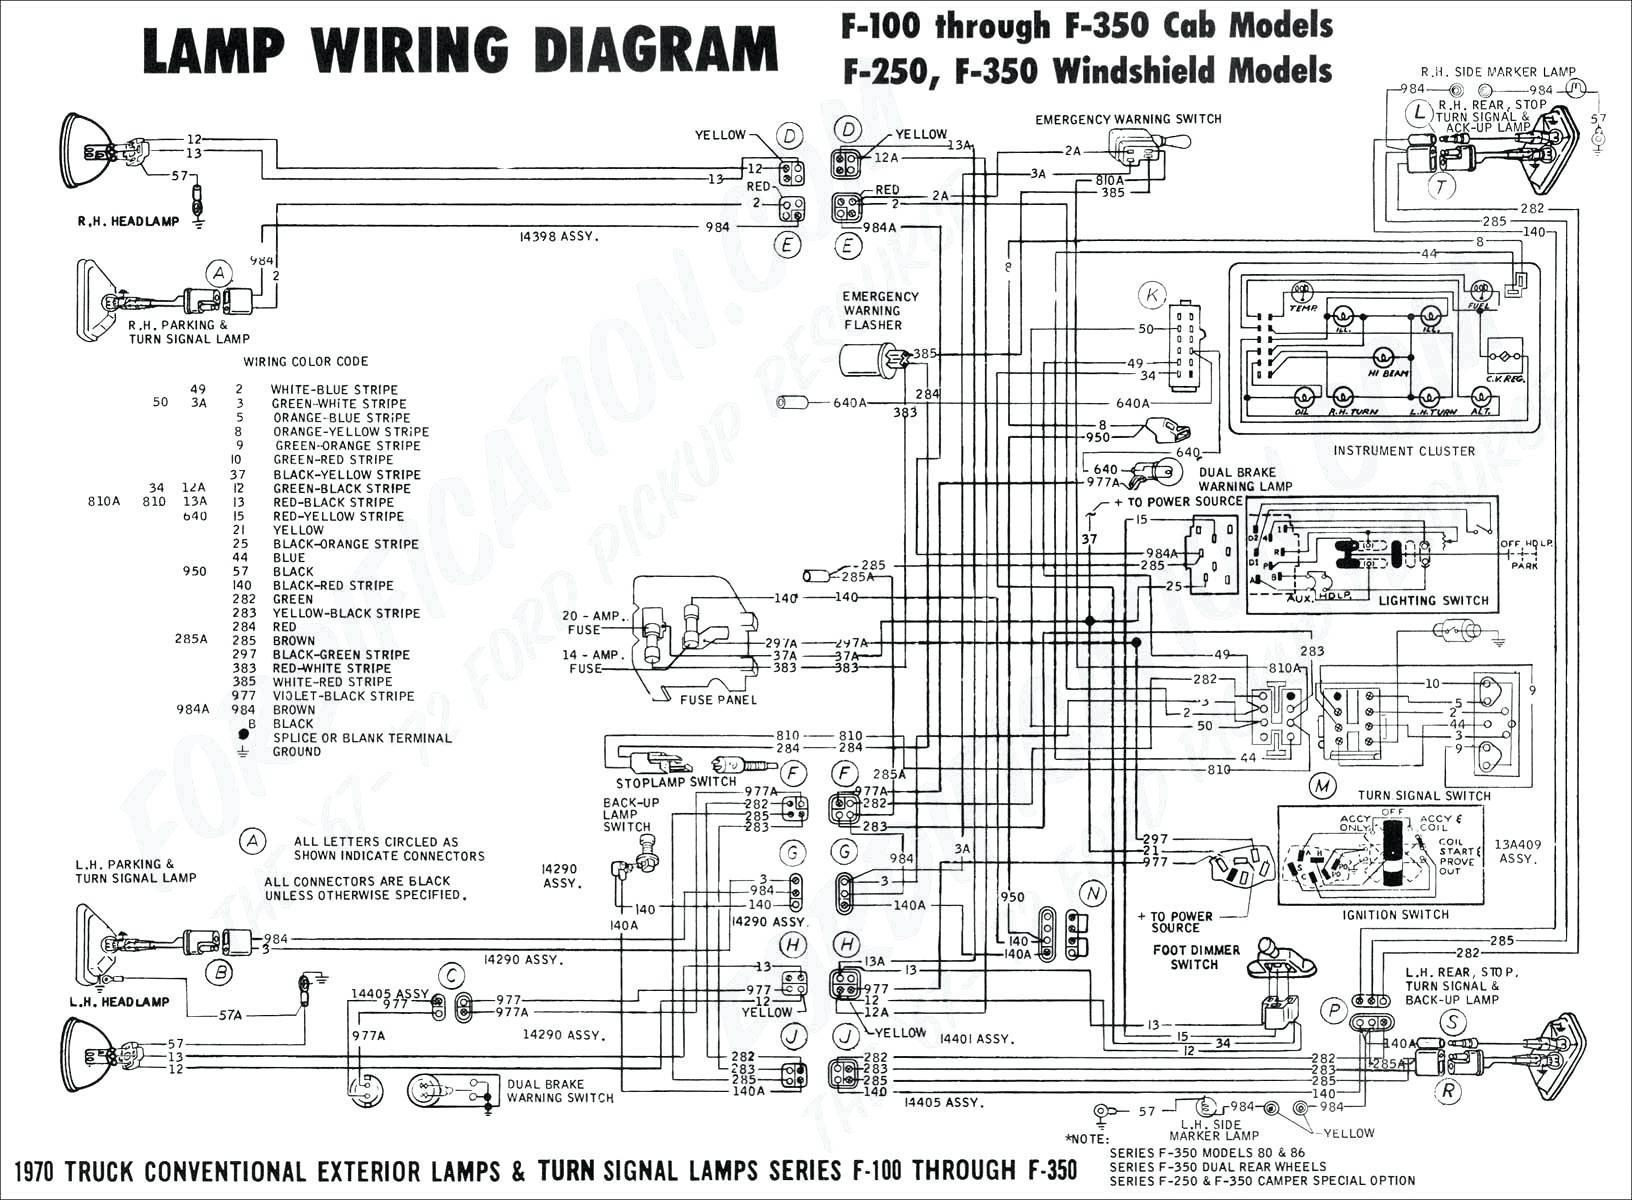 2000 Acura Tl Engine Diagram Acura 3 2 Tl Fuse Box Wiring Diagram Inside Of 2000 Acura Tl Engine Diagram